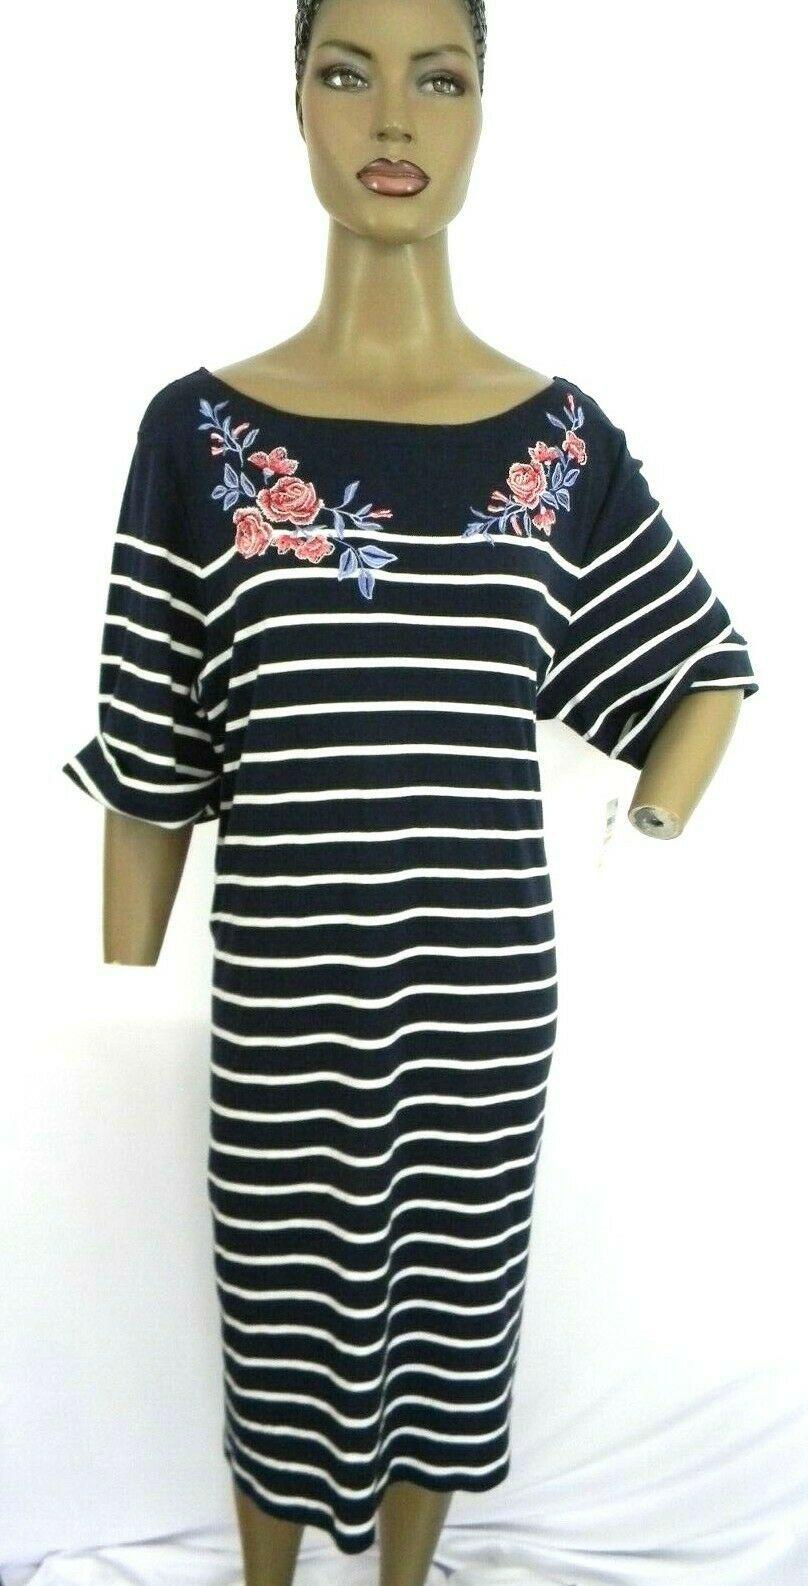 Karen Scott Plus Size 2X,3X Dress Floral Embroidered Striped Shift Dress NEW $54 image 8